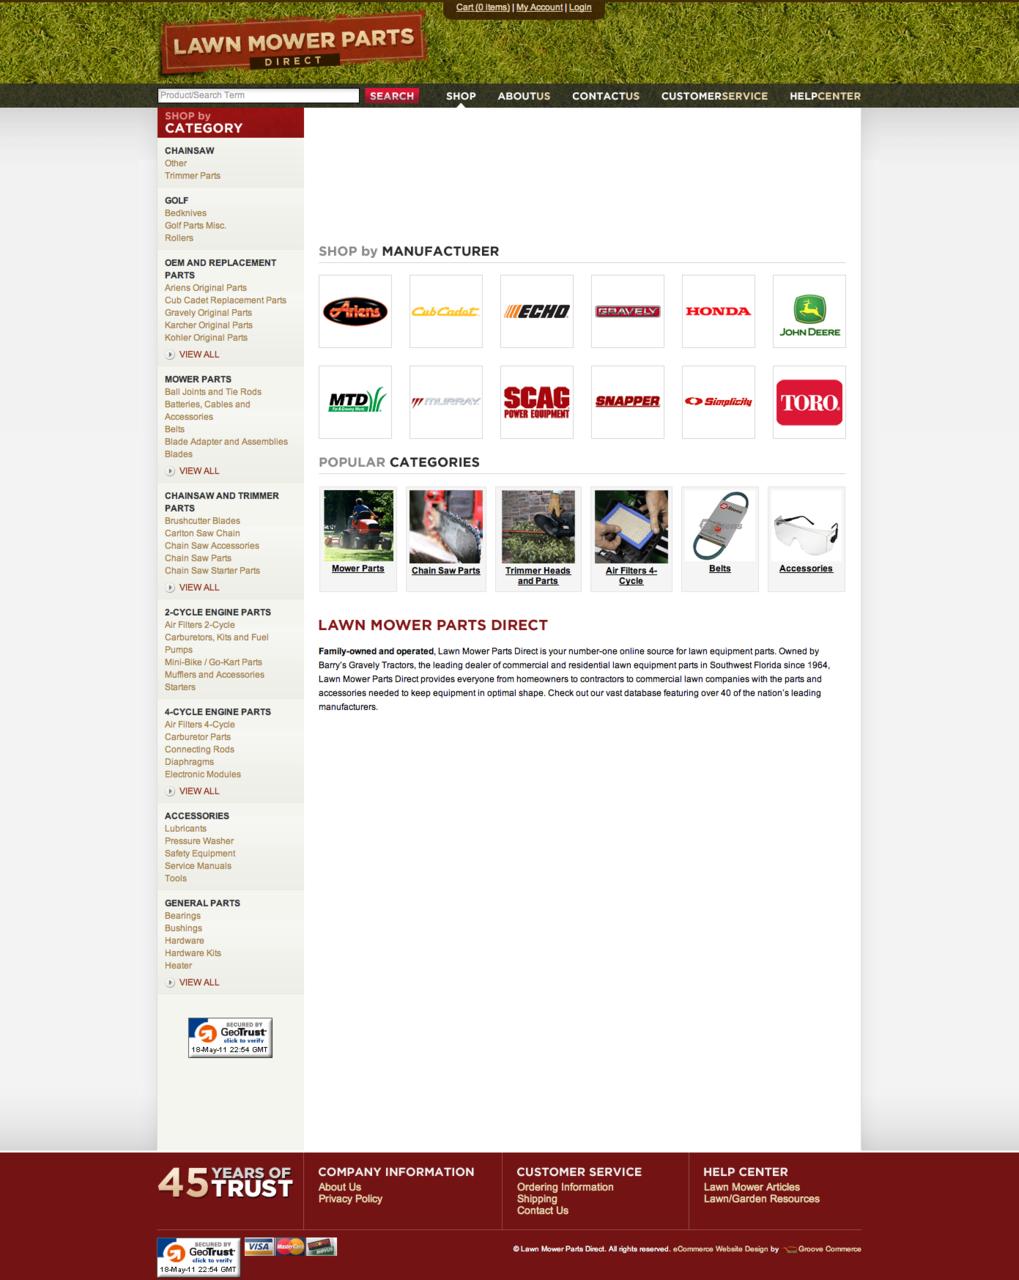 www.lawnmowerpartsdirect.com